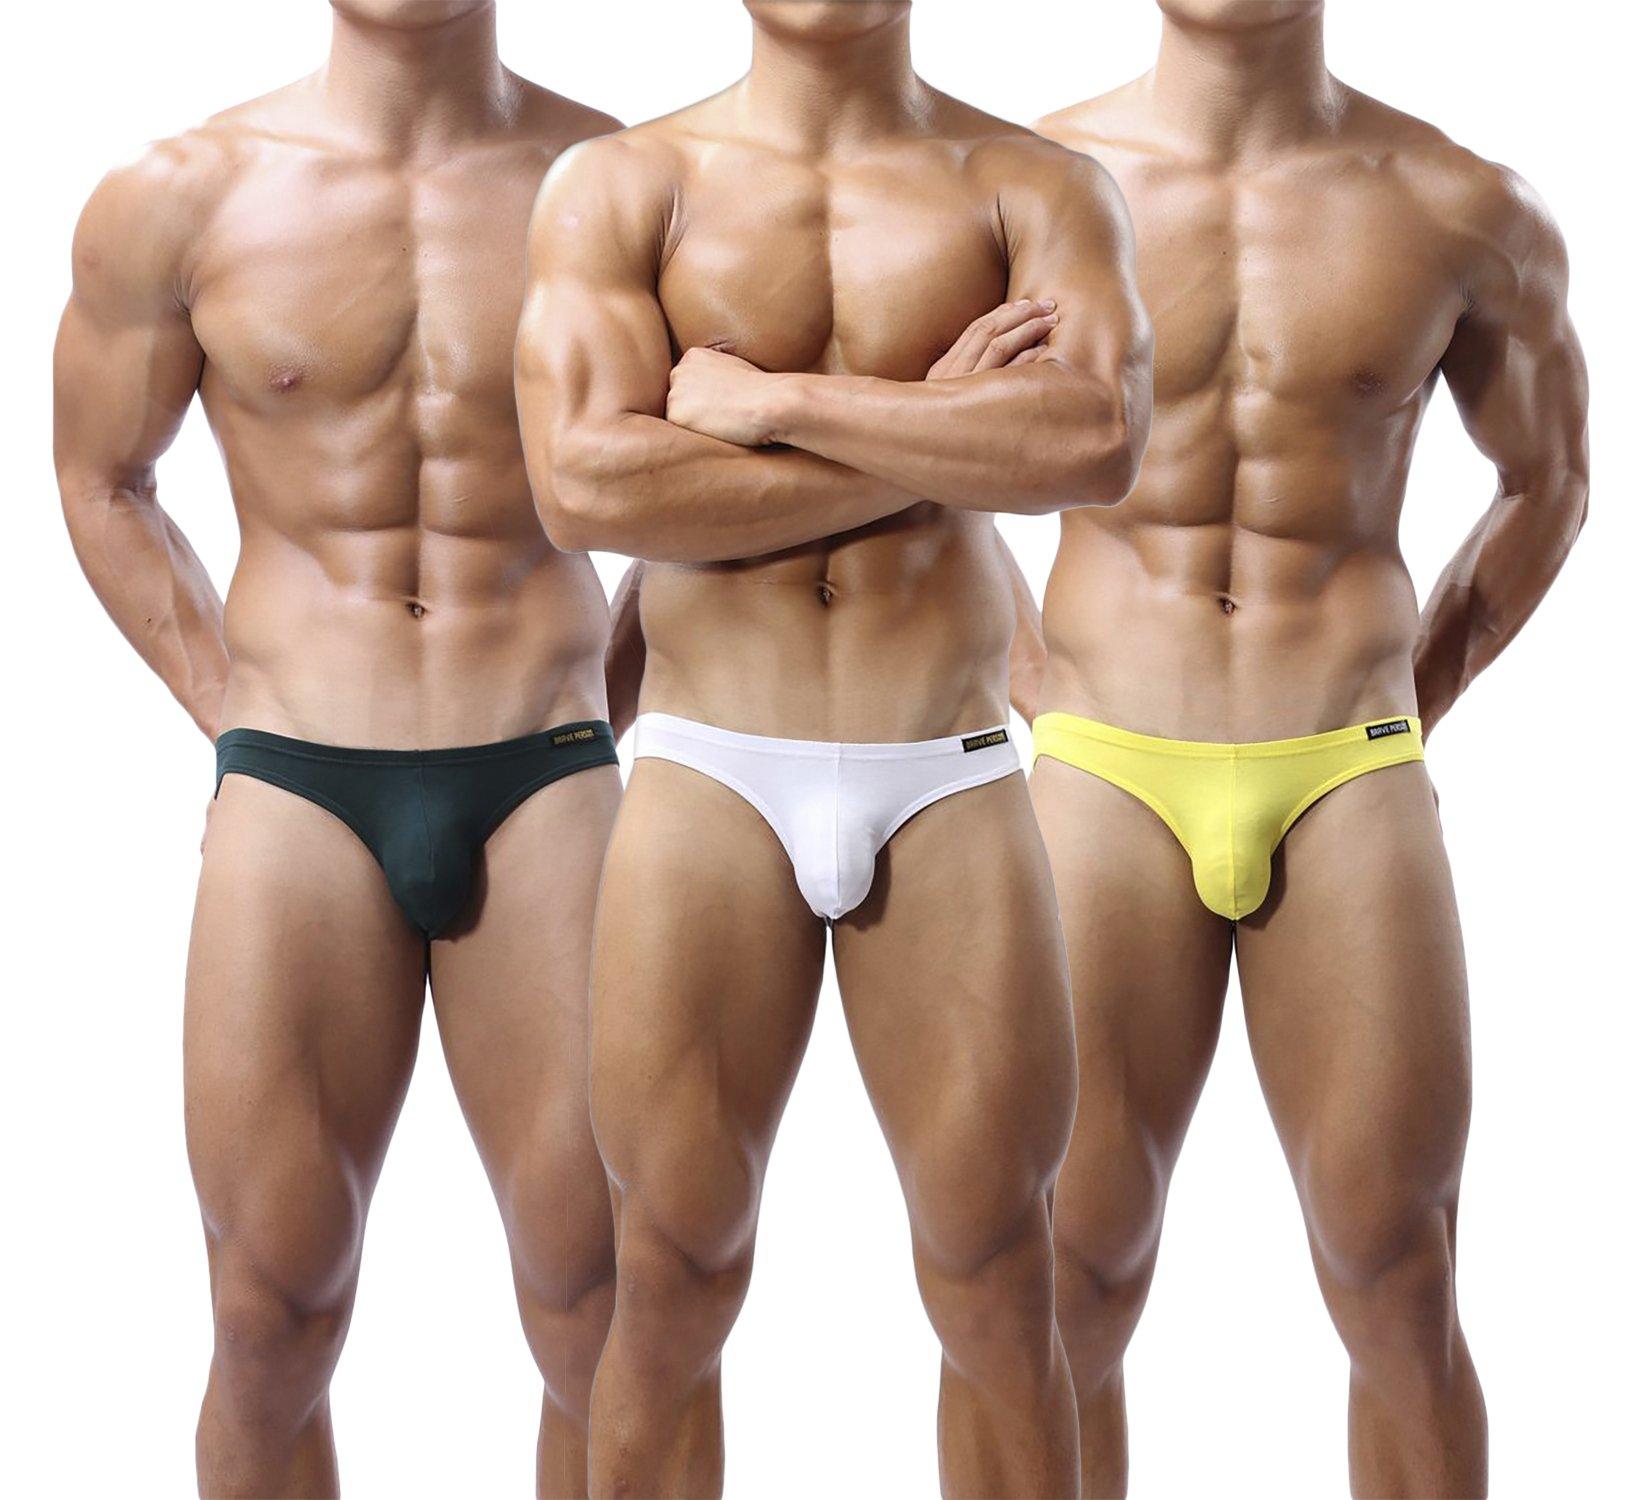 Brave Person Mens Underwear Modal Elastic Comfortable Bikini Briefs SB1112 (X-Large, 3 Pack: Dark Green, White, Yellow)